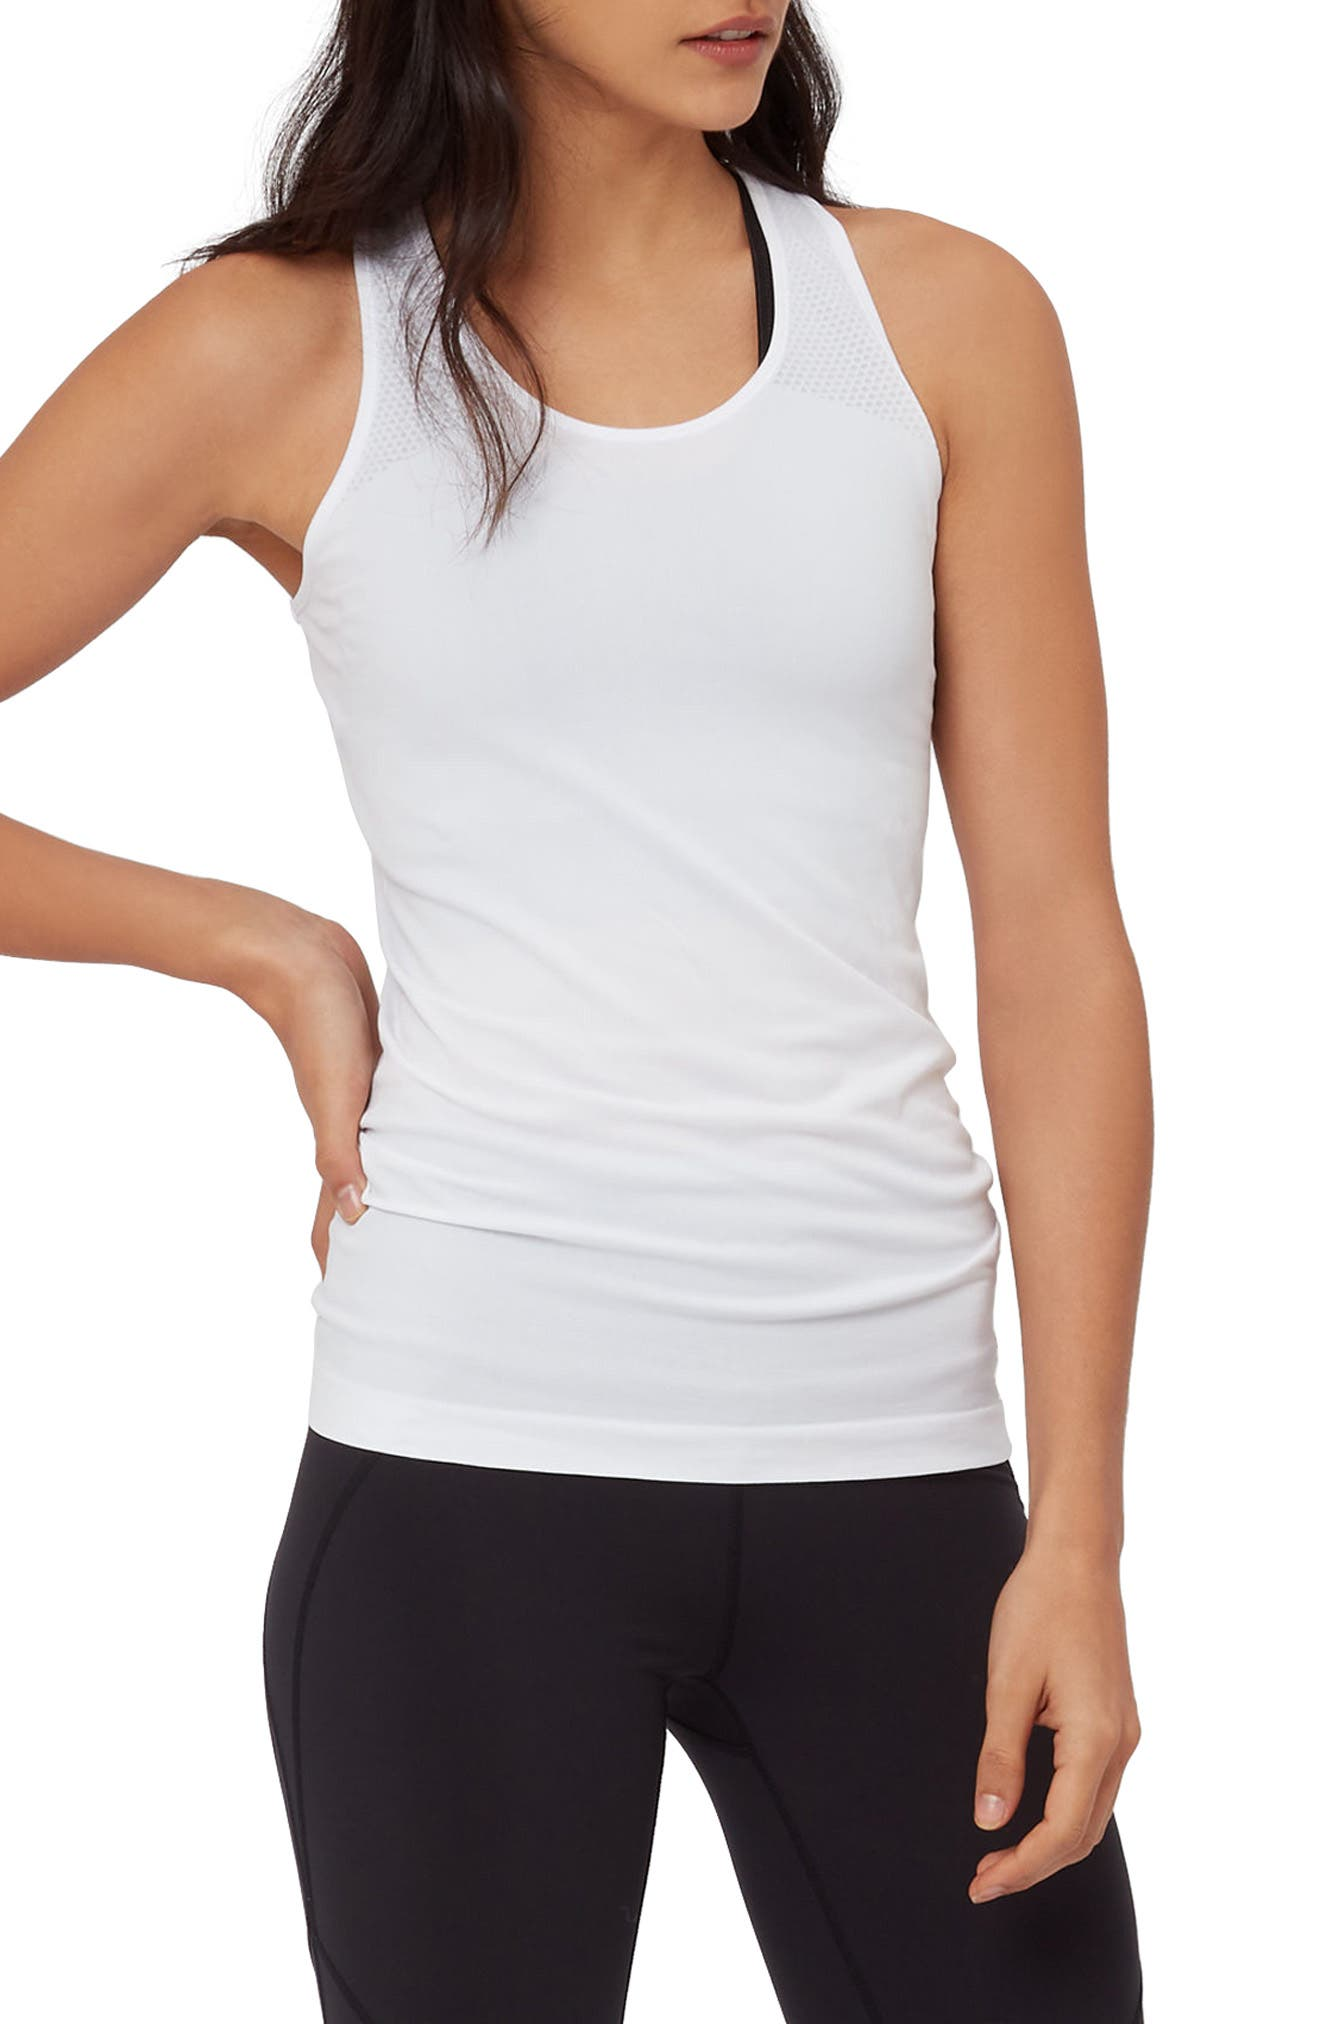 Athlete Seamless Workout Tank,                         Main,                         color, White